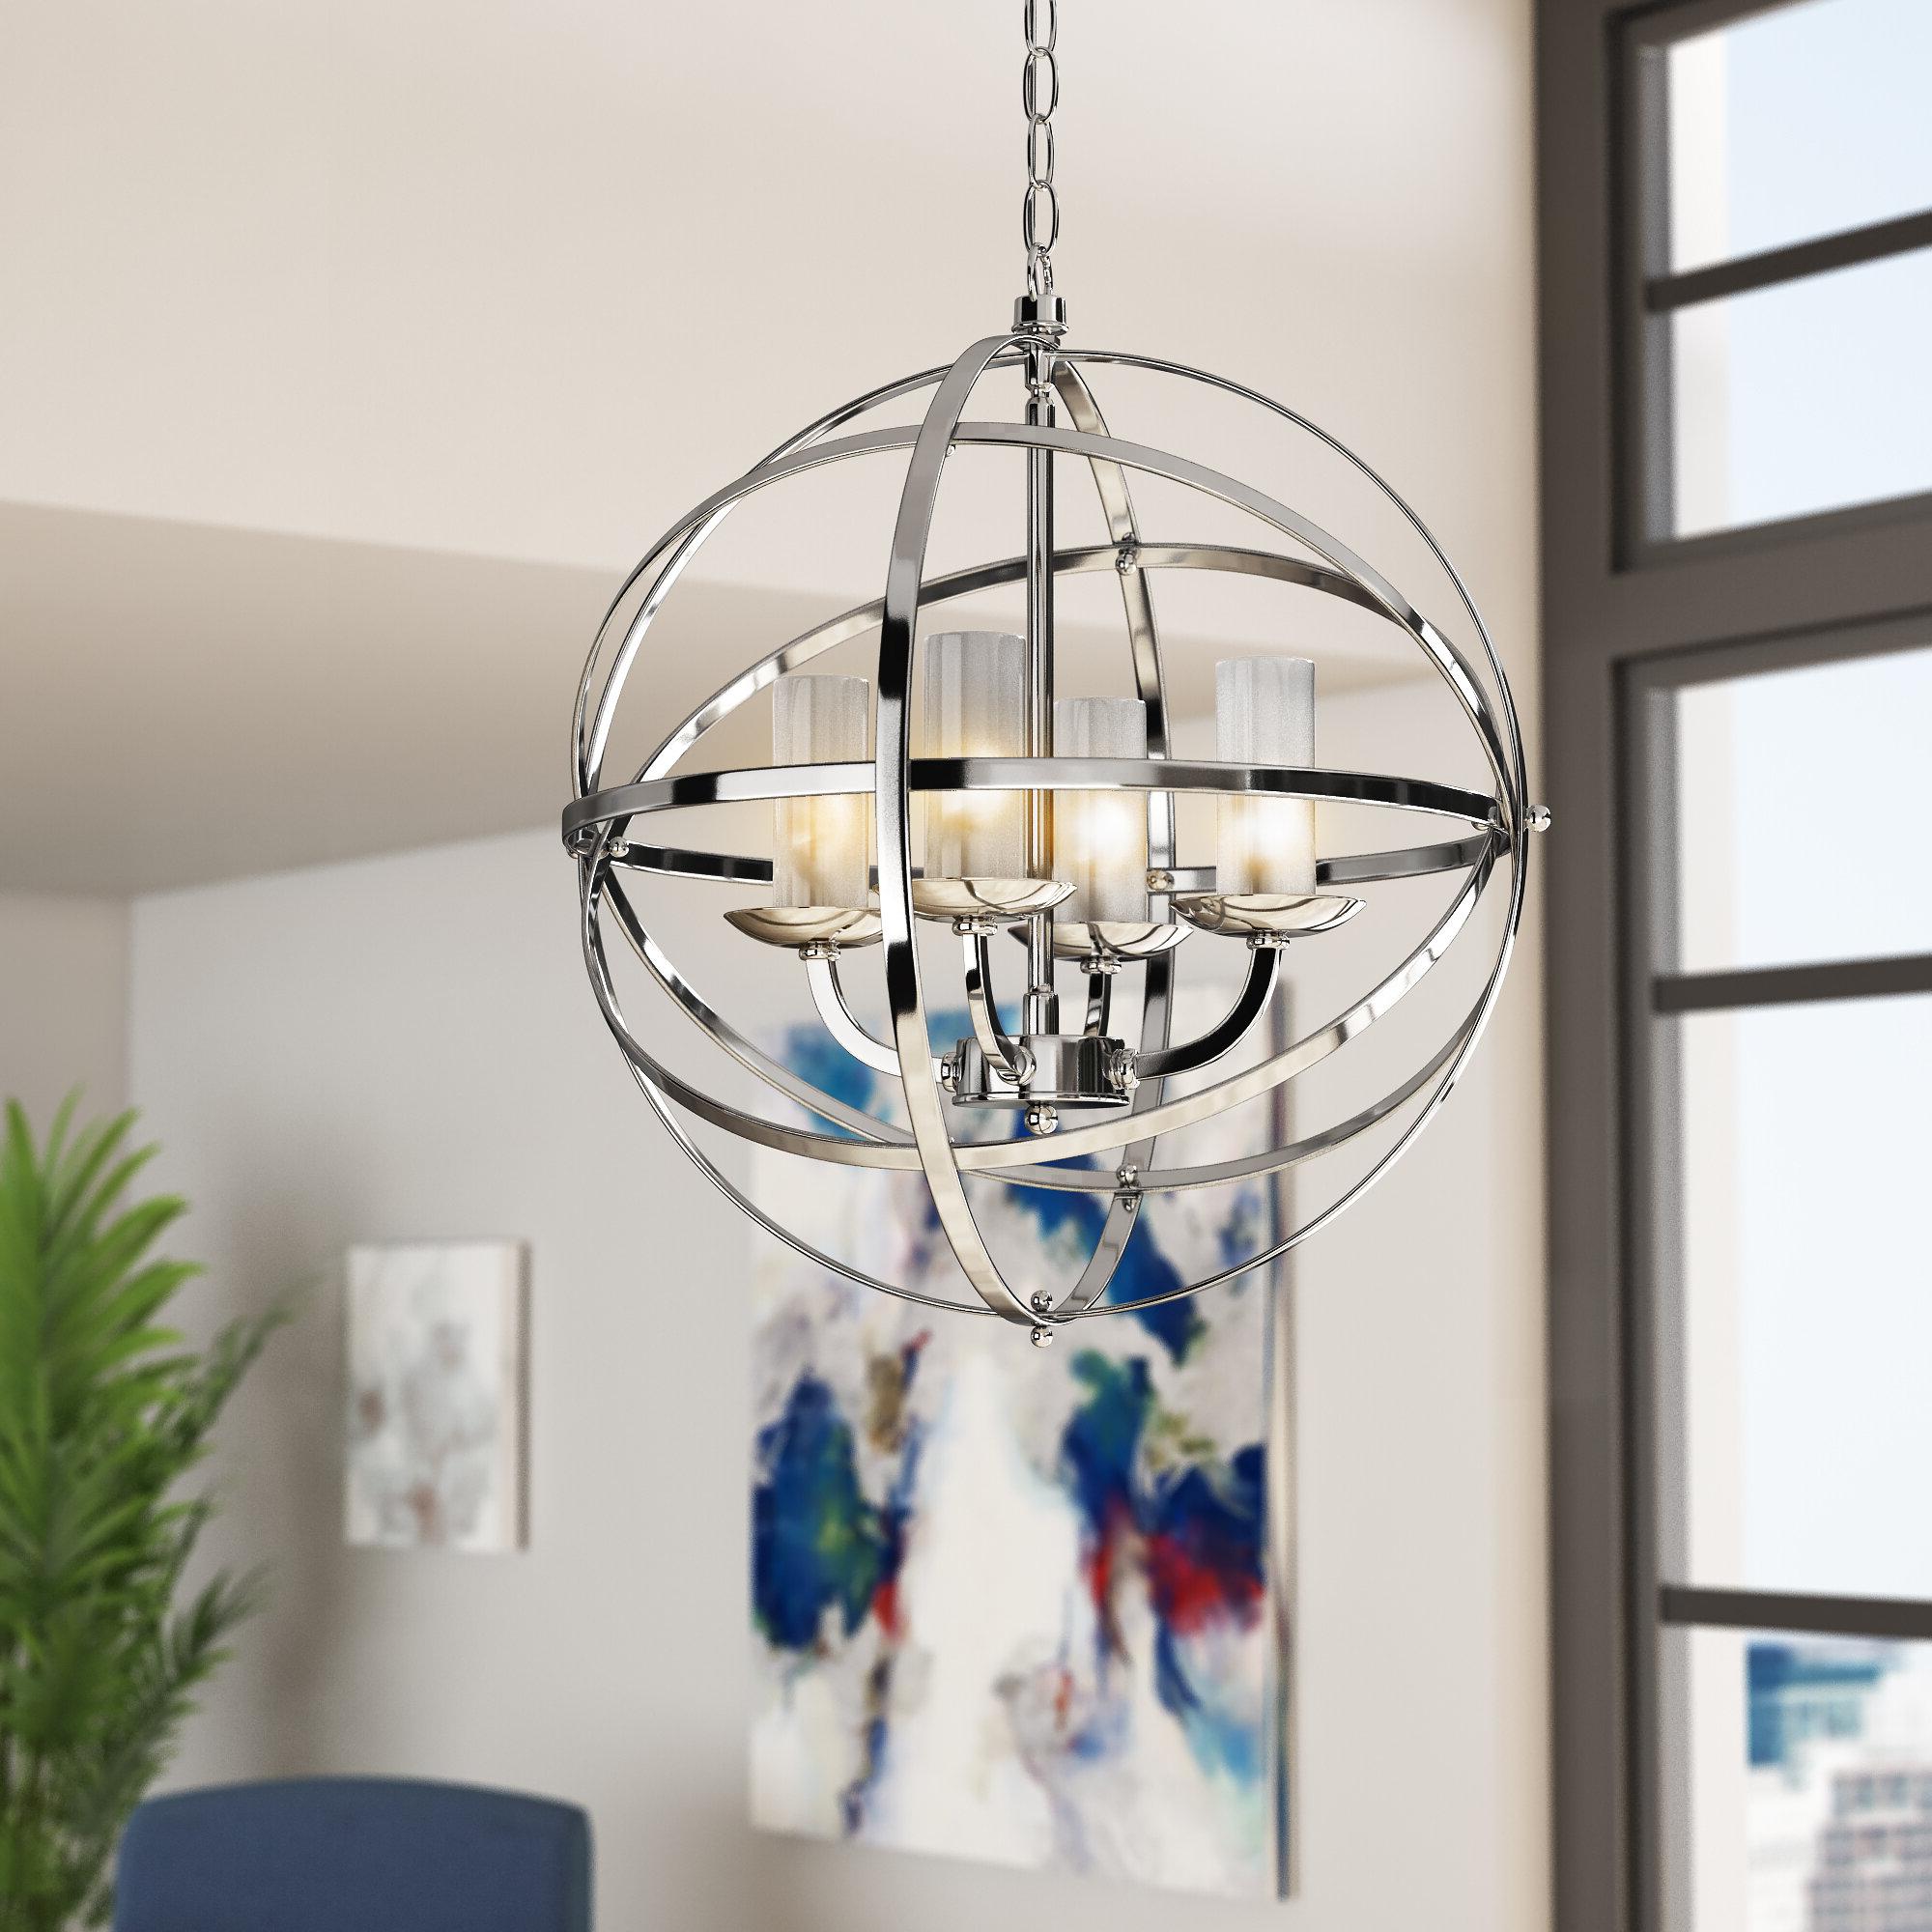 Well Liked Alden 3 Light Single Globe Pendants Intended For Connie 4 Light Single Globe Pendant (View 4 of 25)